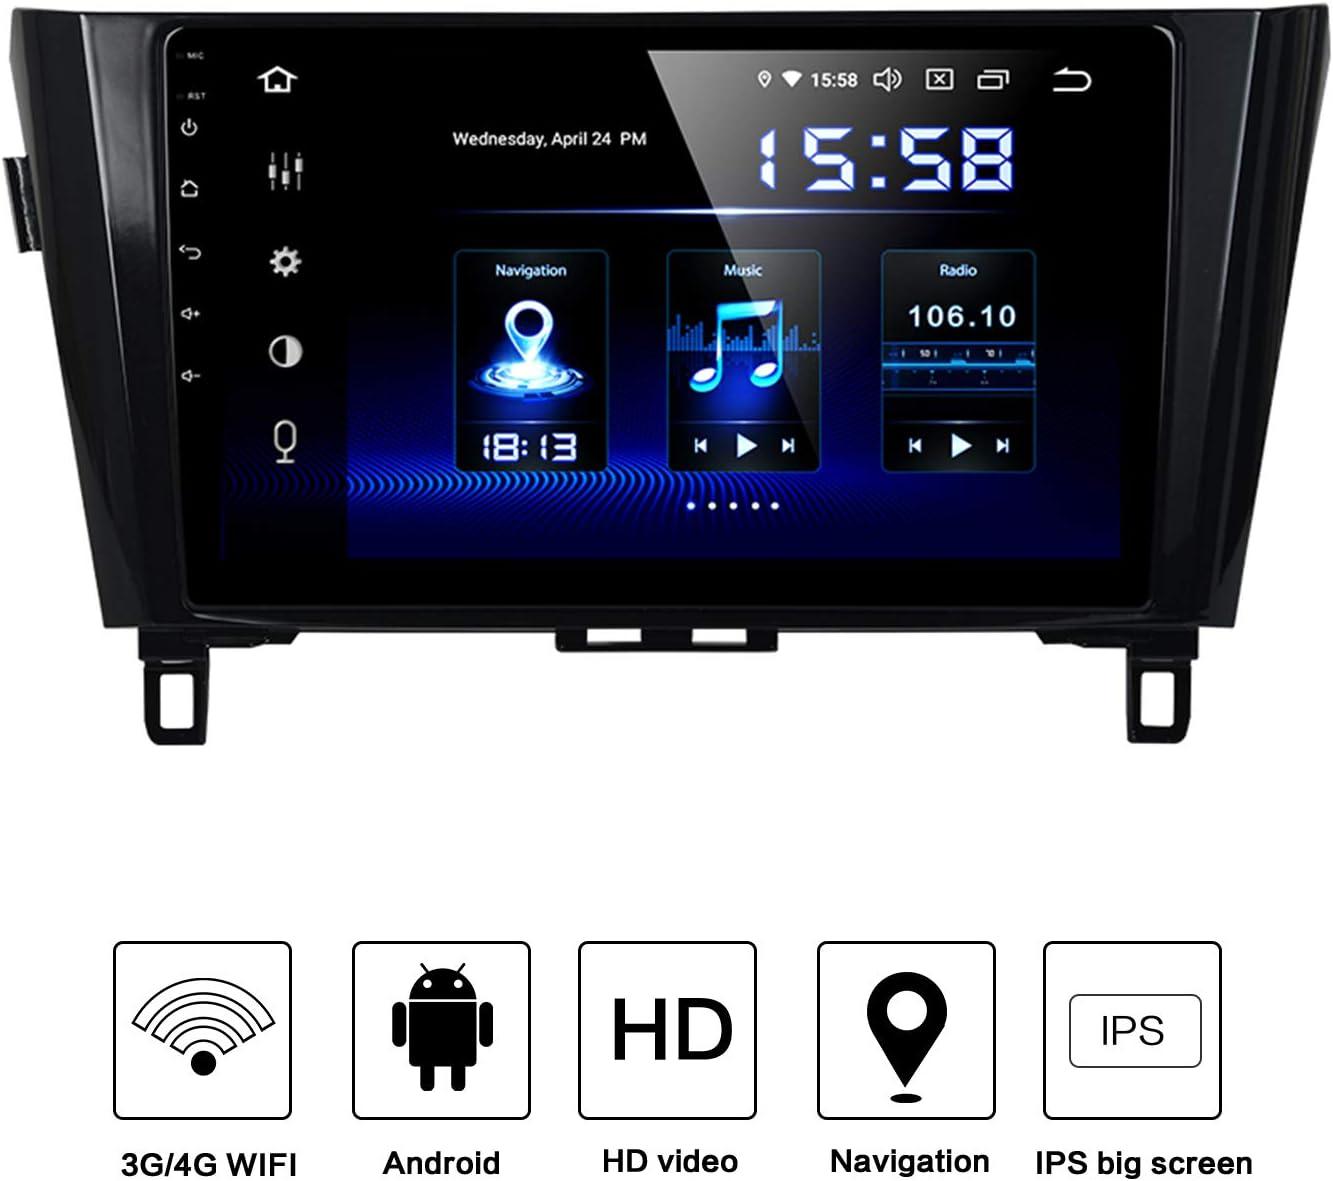 "Dasaita Android 9.0 Car Radio Audio Stereo for Nissan X-Trail Qashqai 2014-2017 Bluetooth GPS Navigation Head Unit Car Vehicle Music Video Player Multimedia 10.2"" Touchscreen Hexa Core 4G+64G 61fhaIIRa5LSL1500_"